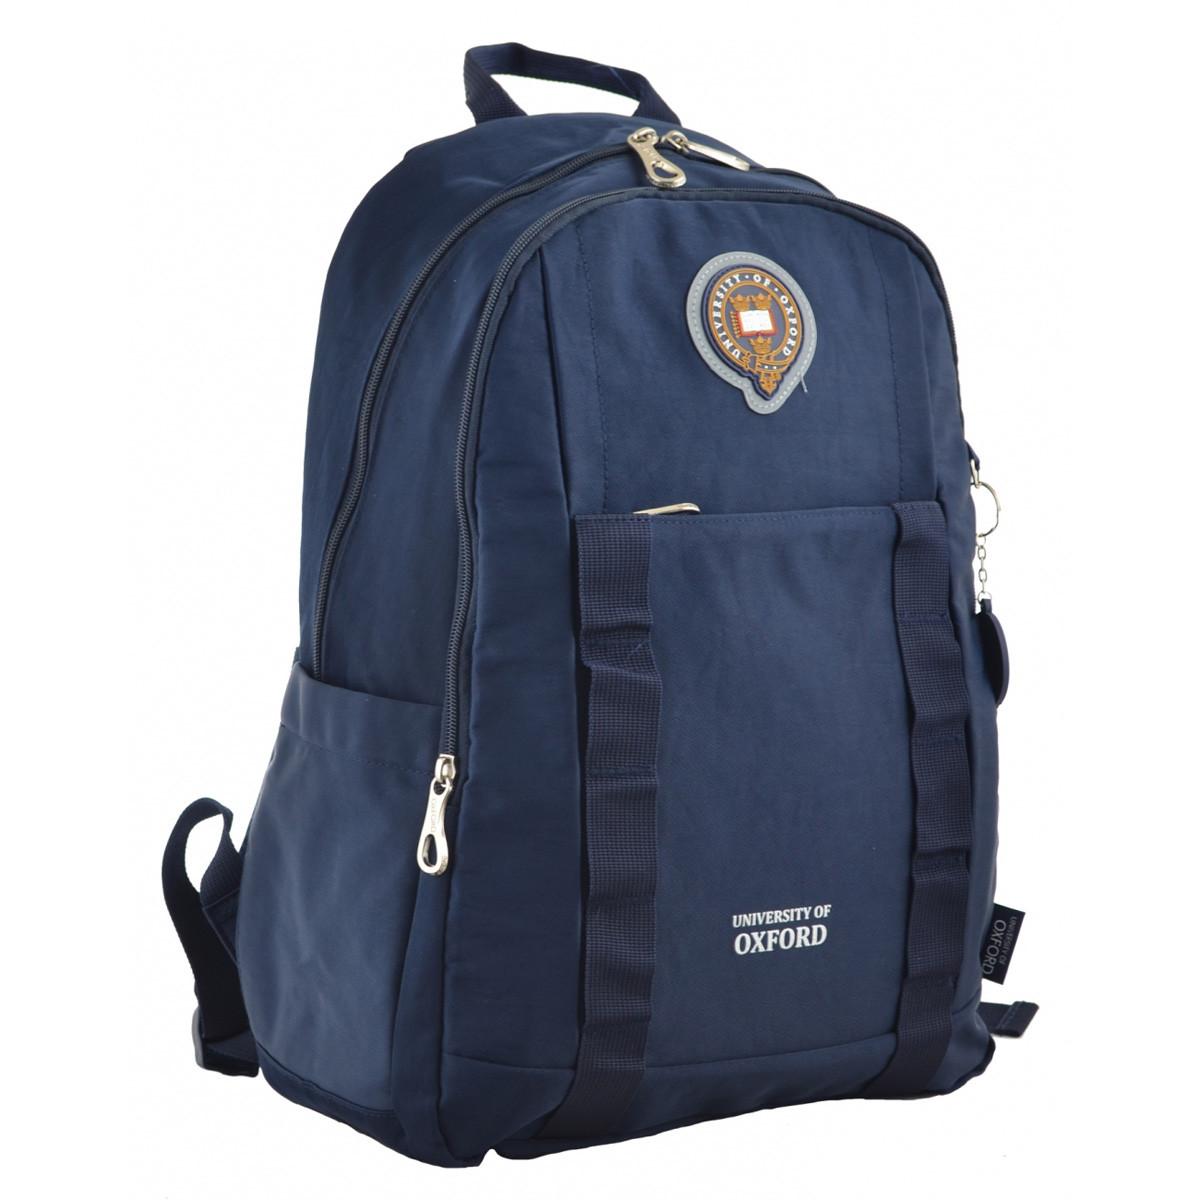 Рюкзак молодежный YES OX 348, 45*30*14, синий код: 555600